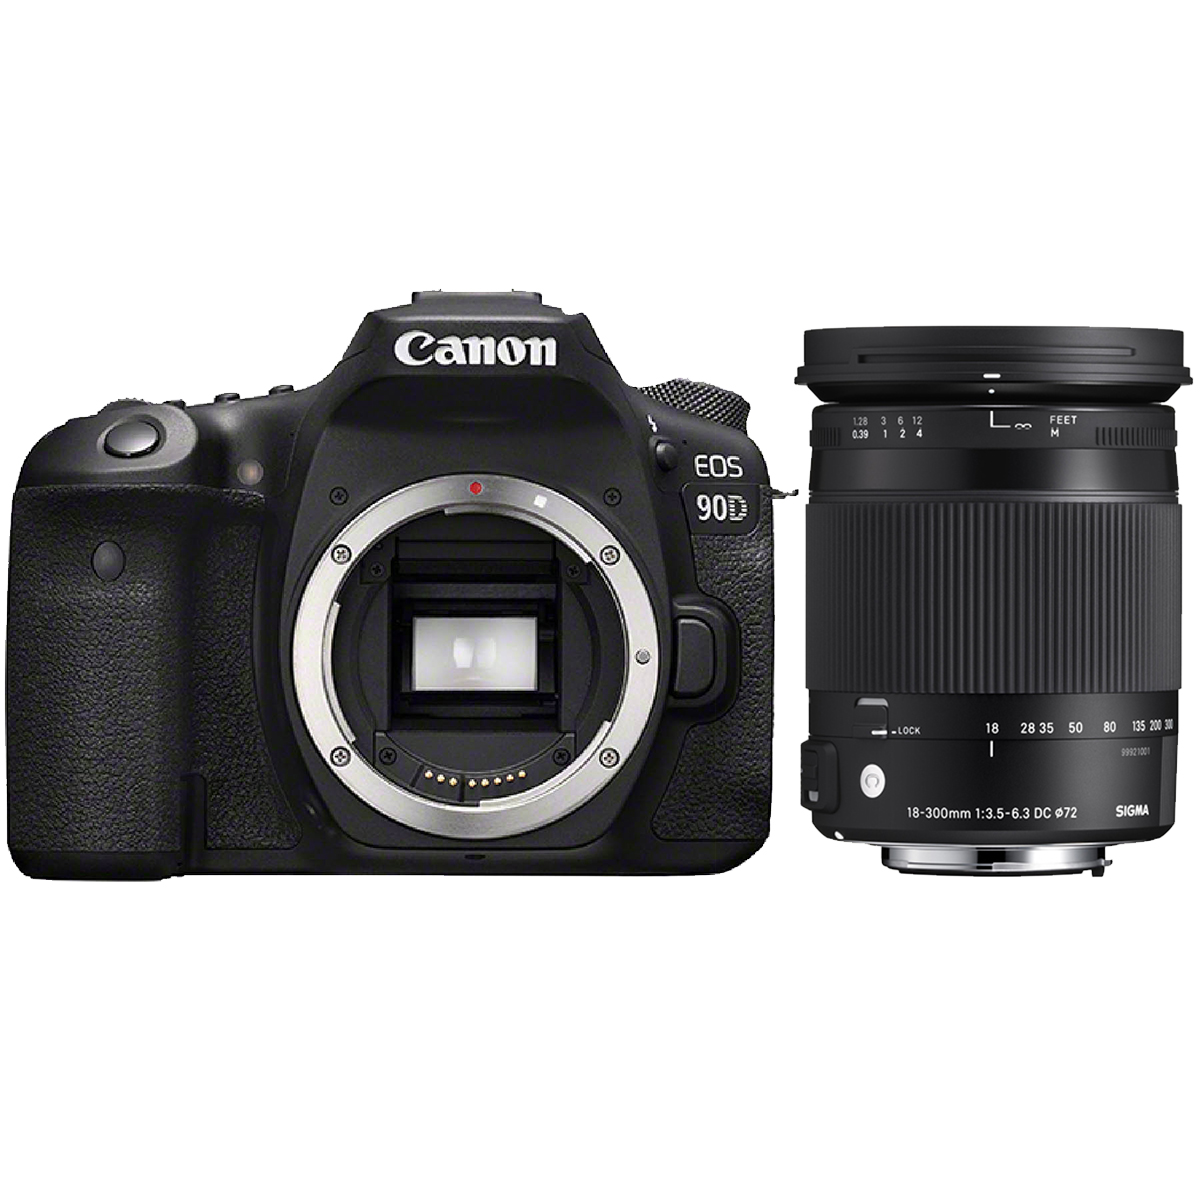 Canon EOS 90D + Sigma 18-300mm 3,5-6,3 DC Makro OS HSM C